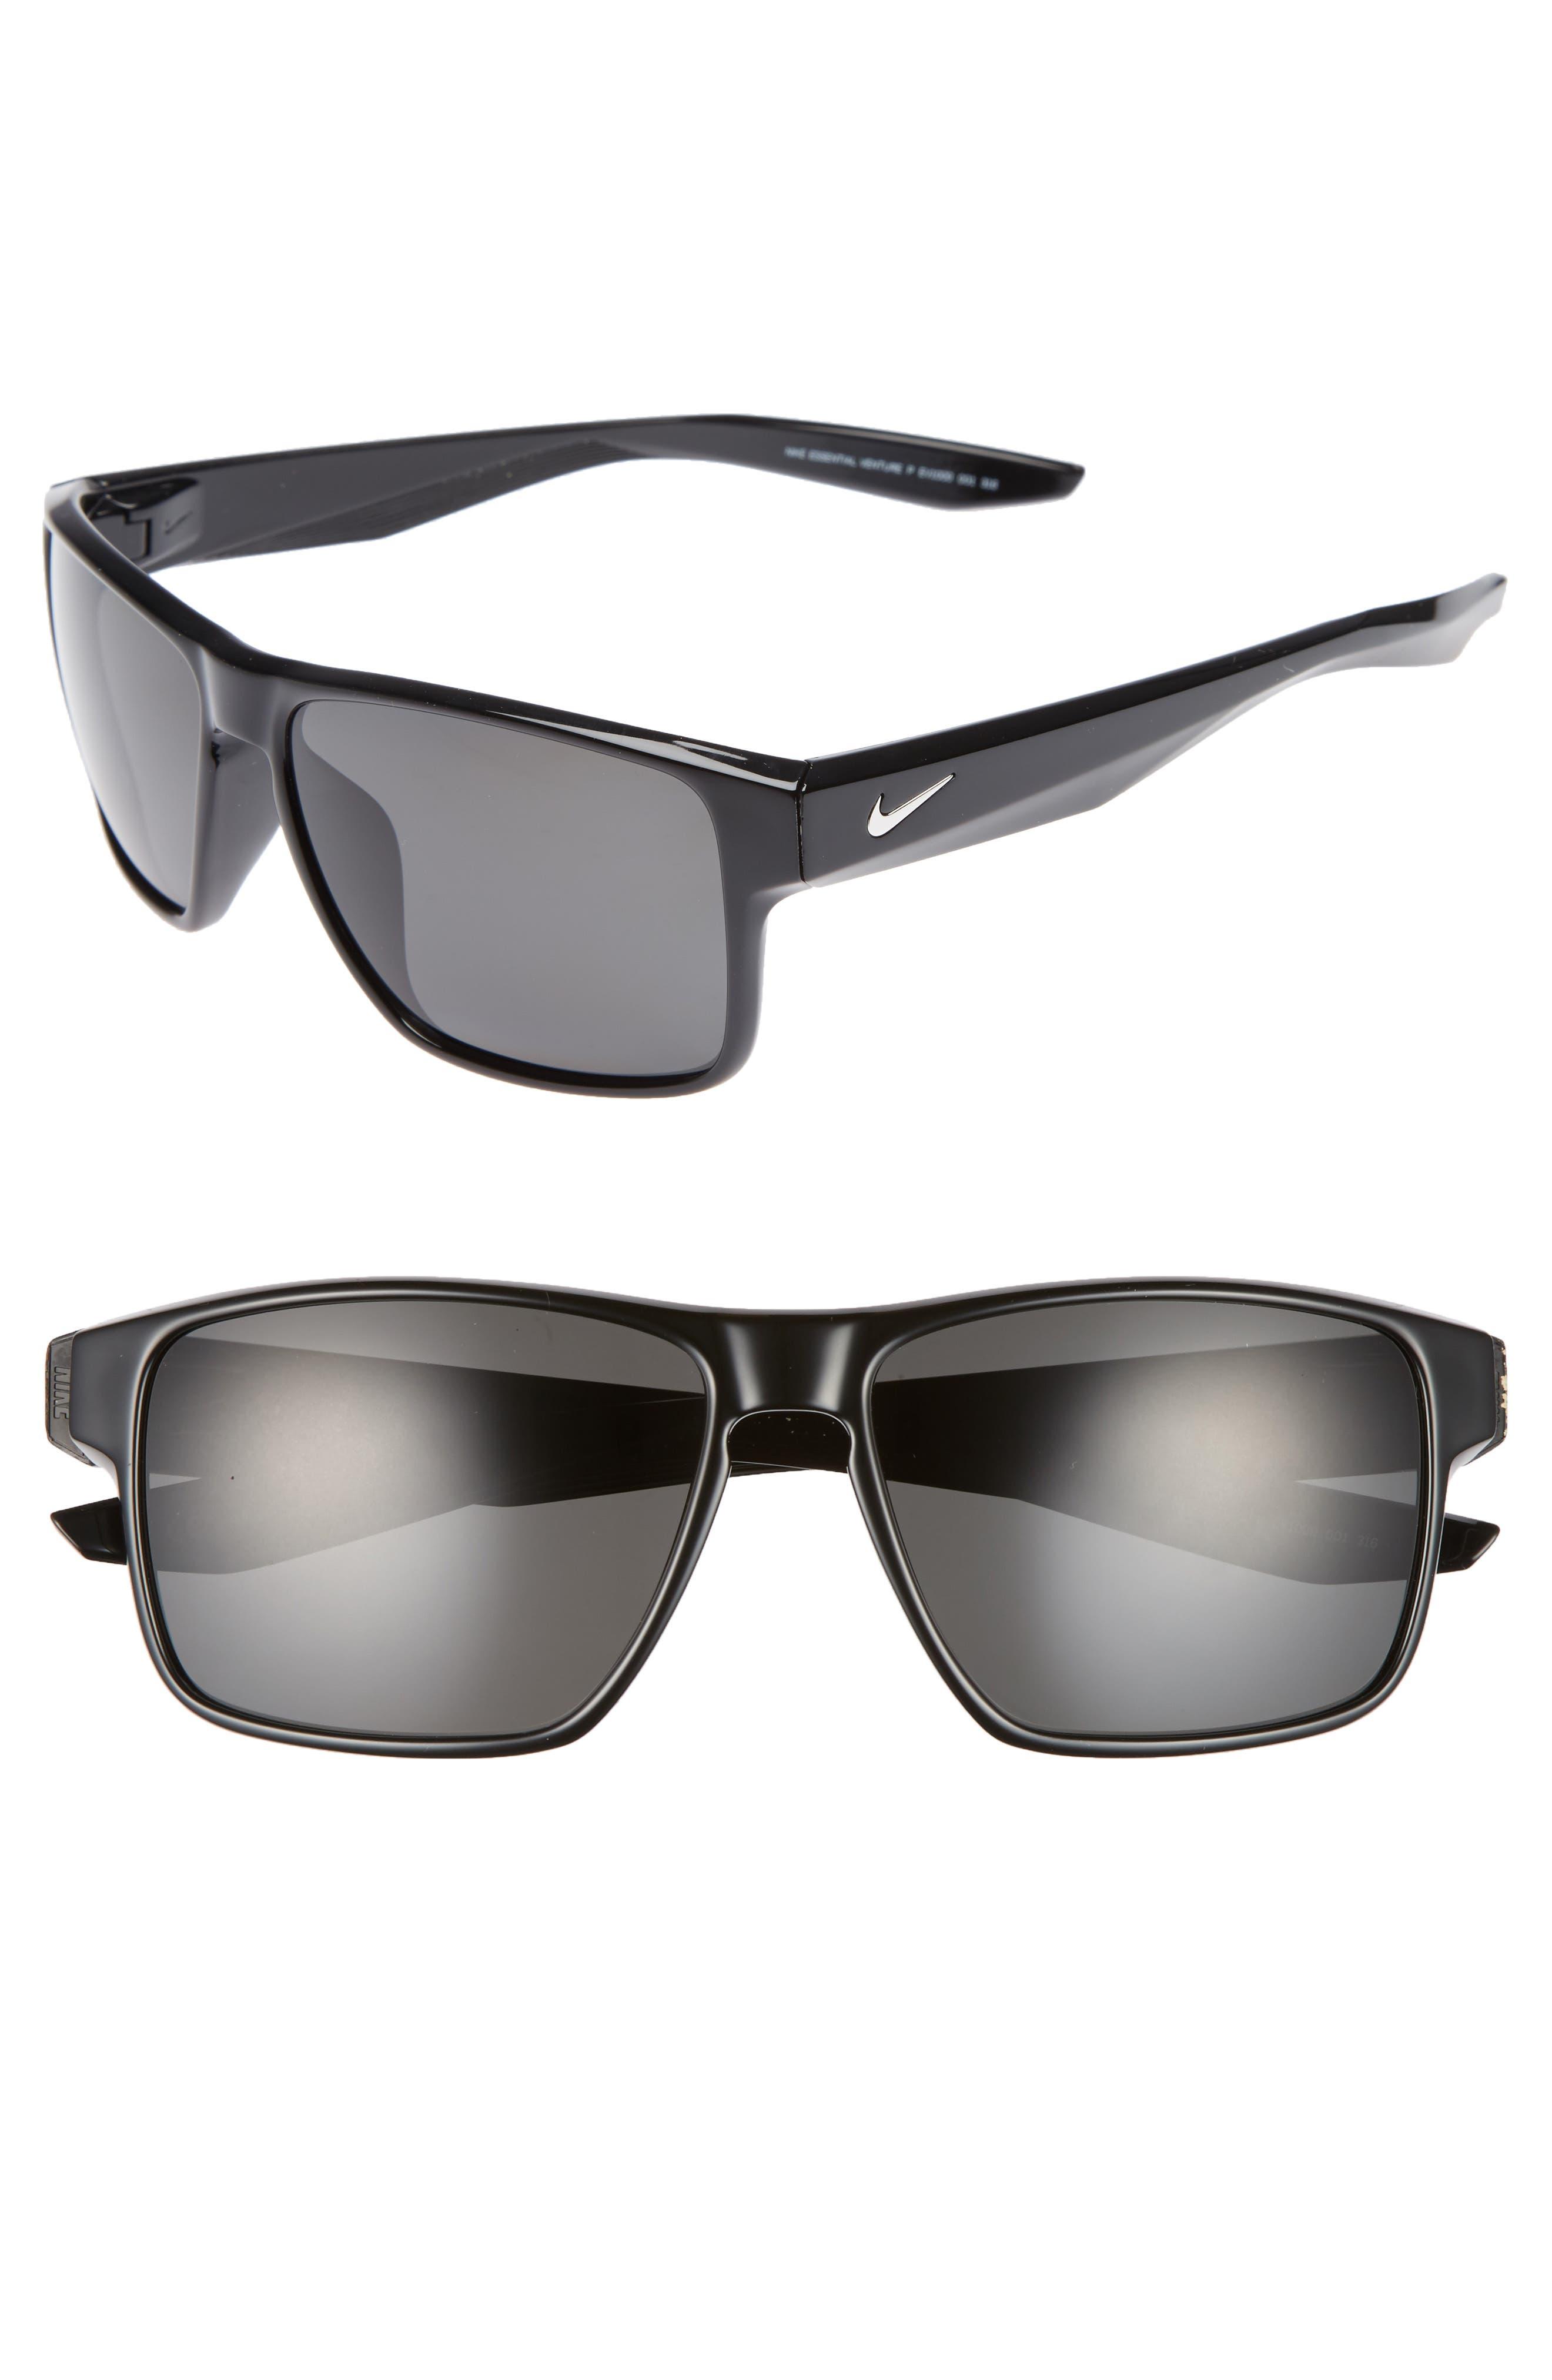 Essential Venture 59mm Polarized Sport Sunglasses, Main, color, 001